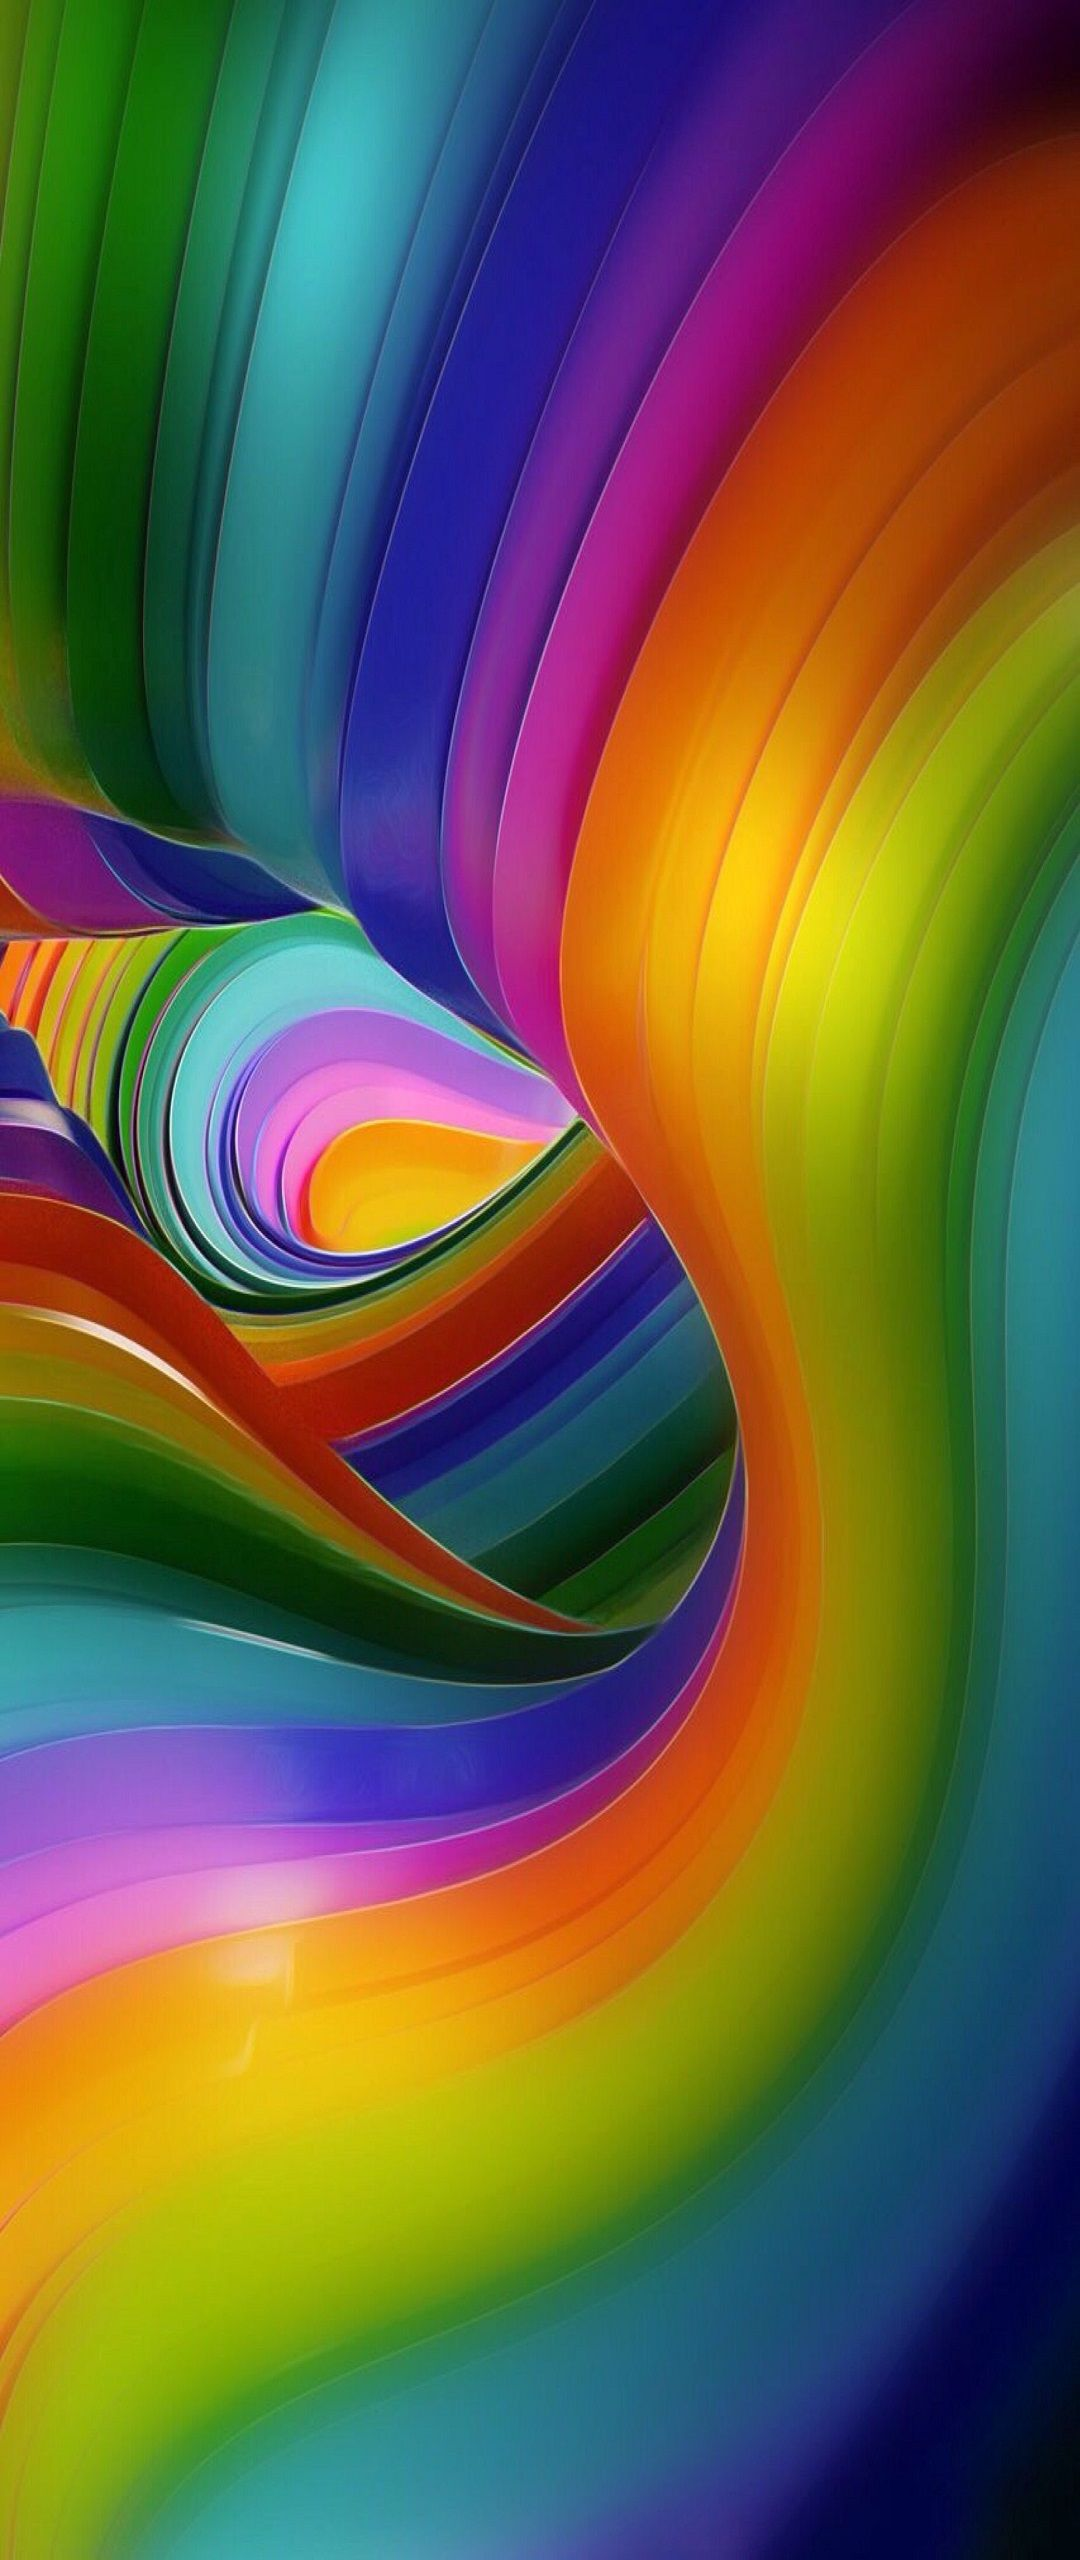 Redmi Note 8 Pro Wallpaper Colorful Art Fractal Art Whatsapp Wallpaper Backgrounds Pattern